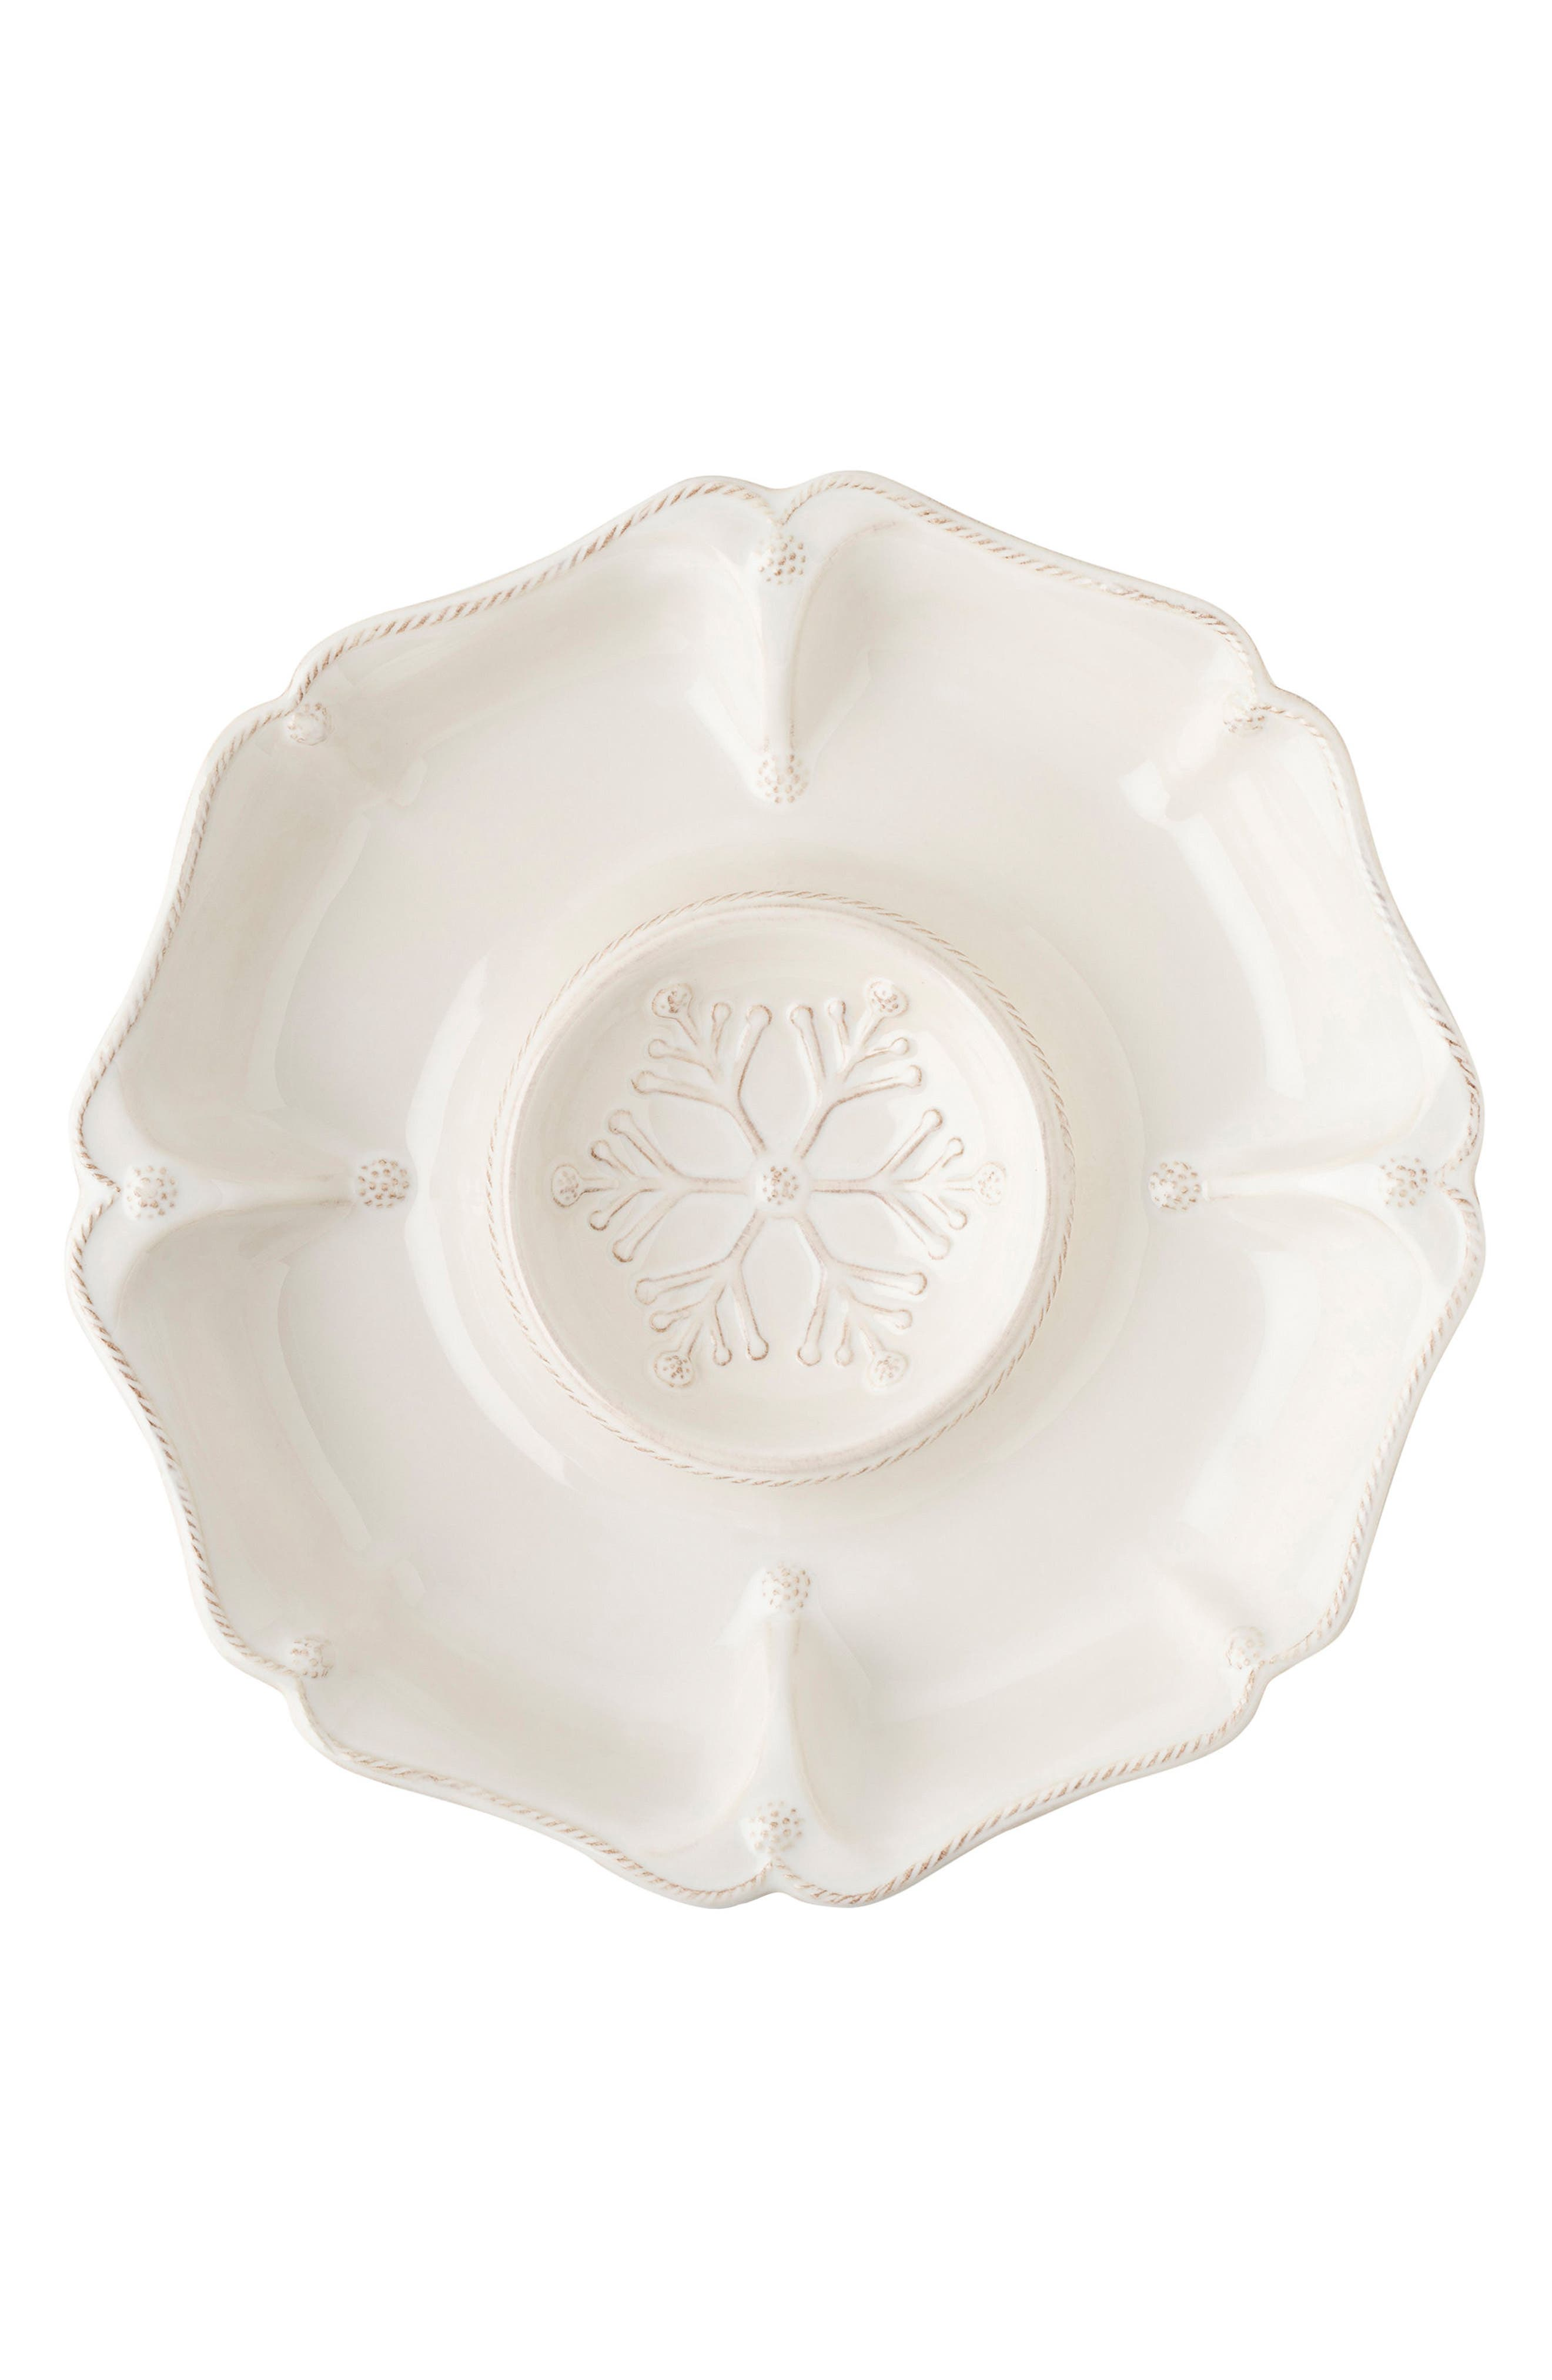 Juliska Berry & Thread Ceramic Hors D'Oeuvres Serving Tray